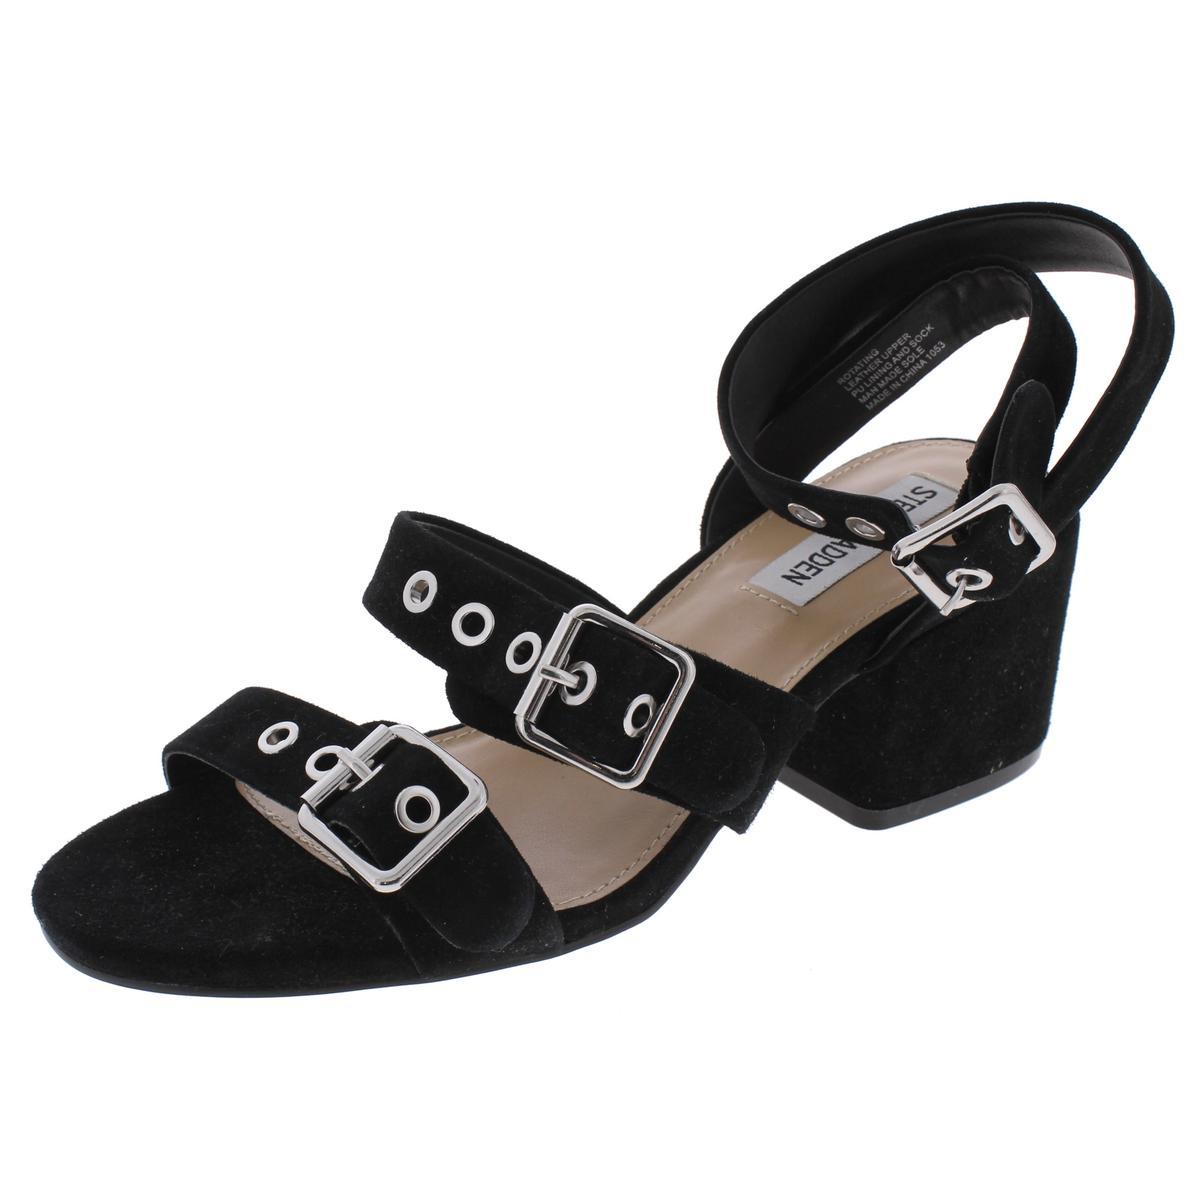 Steve-Madden-Womens-Rotating-Open-Toe-Double-Strap-Dress-Sandals-Shoes-BHFO-4421 thumbnail 5